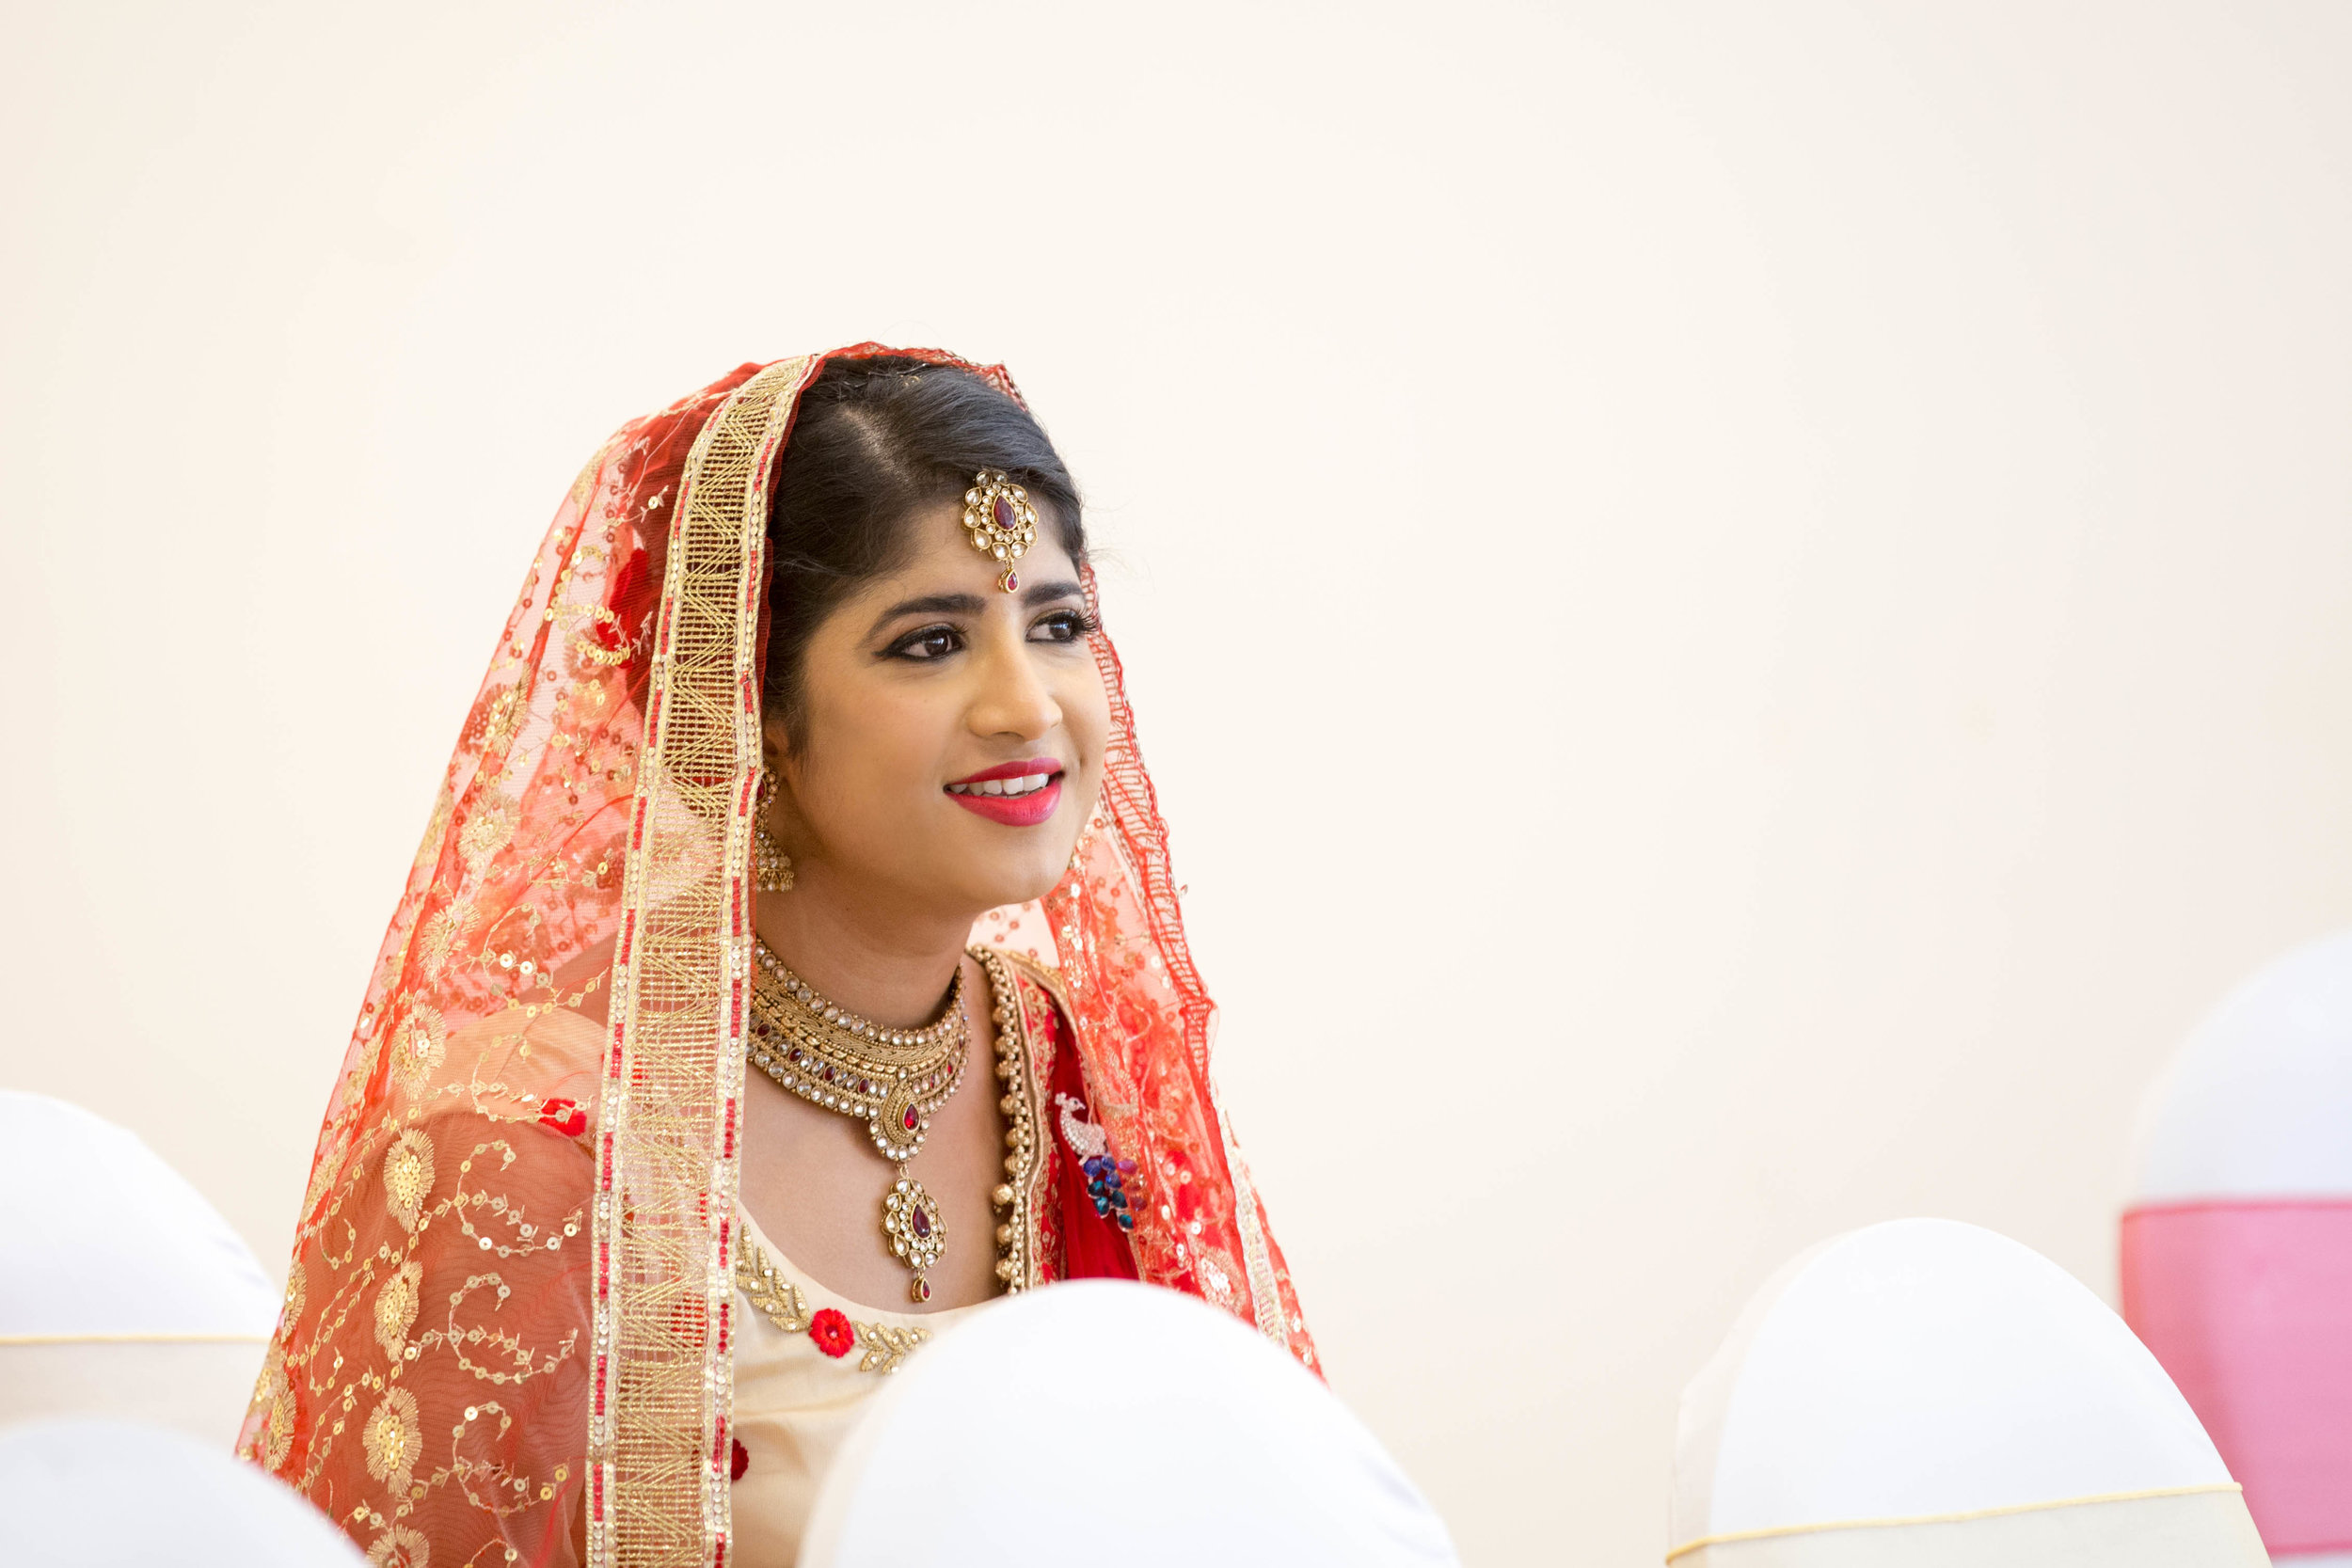 ramada-park-hall-hotel-birmingham-wolverhampton-hindu-wedding-asian-wedding-photography-natalia-smith-photography-14.jpg